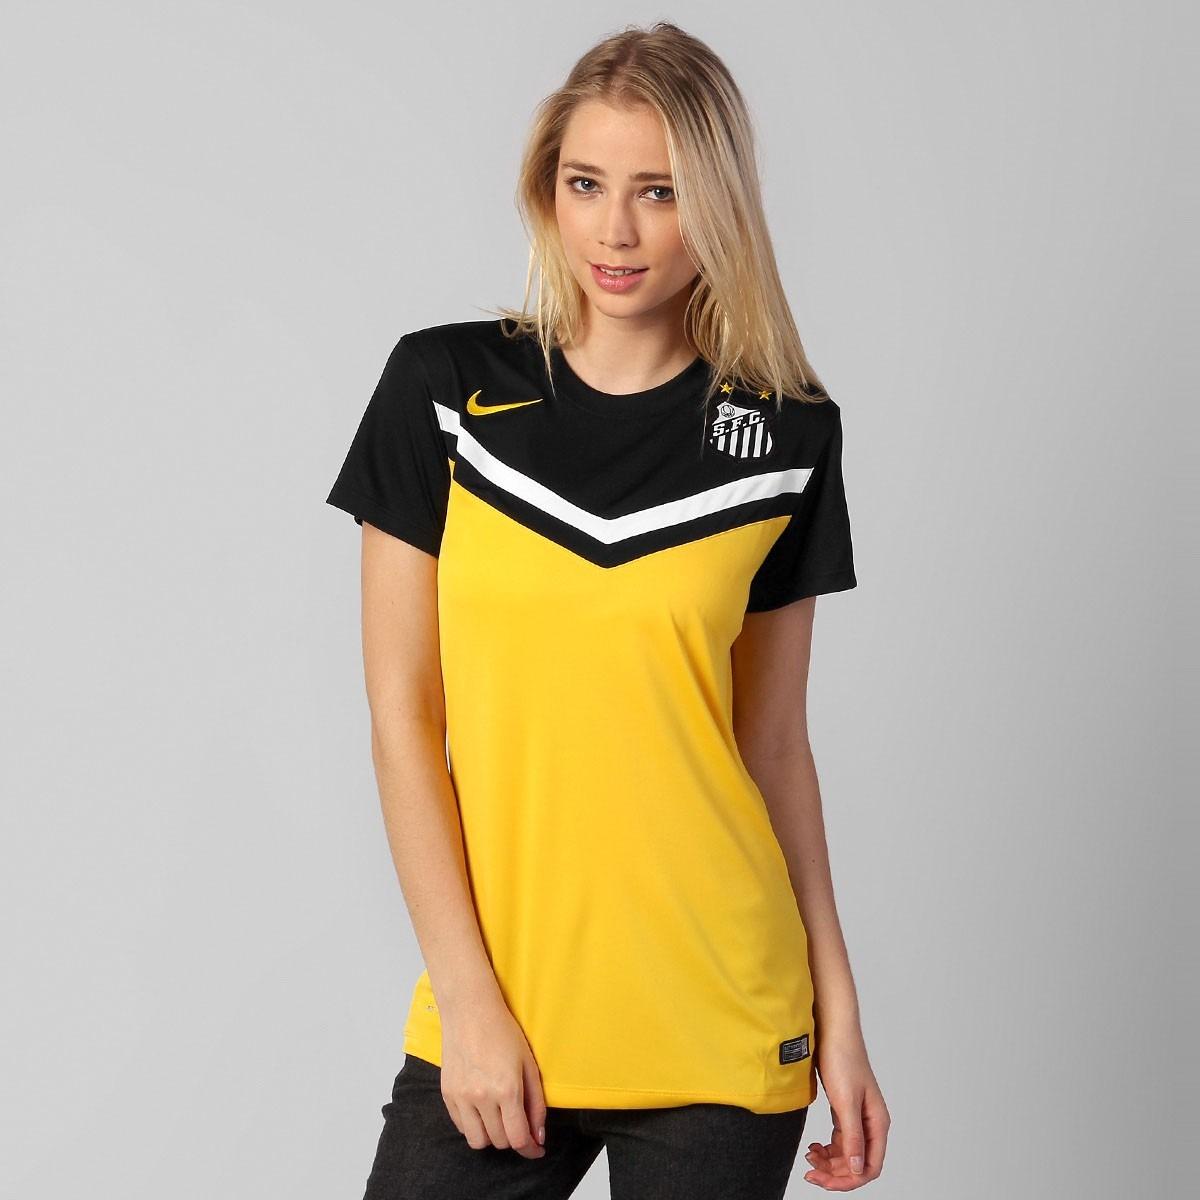 d382a67cb0 Camisa Feminina Nike Santos Iii 2014 S nº Nova Original C nf - R  99 ...